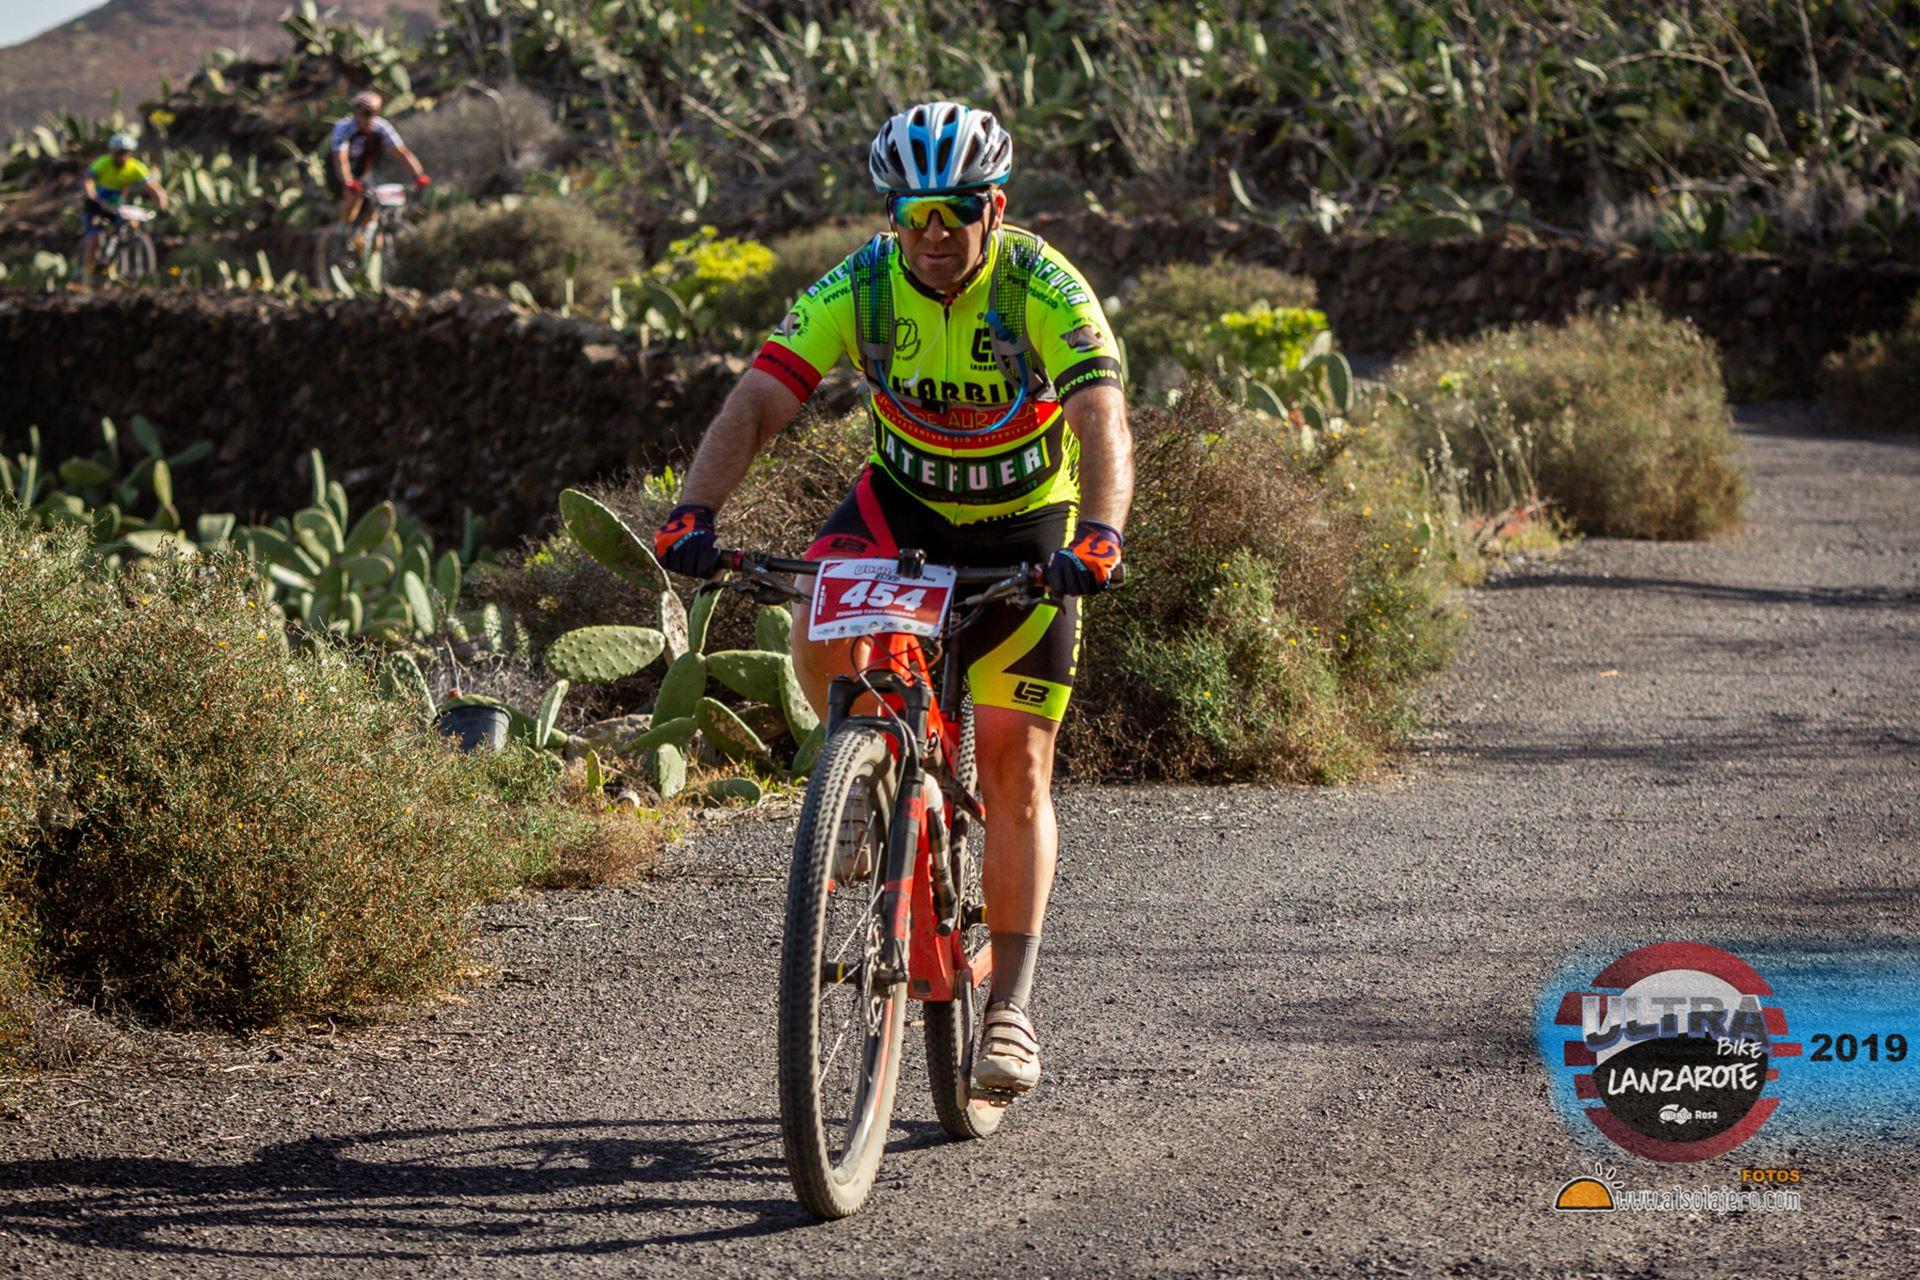 Sector Guatiza 2ª Etapa Ultrabike 2019 Fotos Alsolajero.com-144